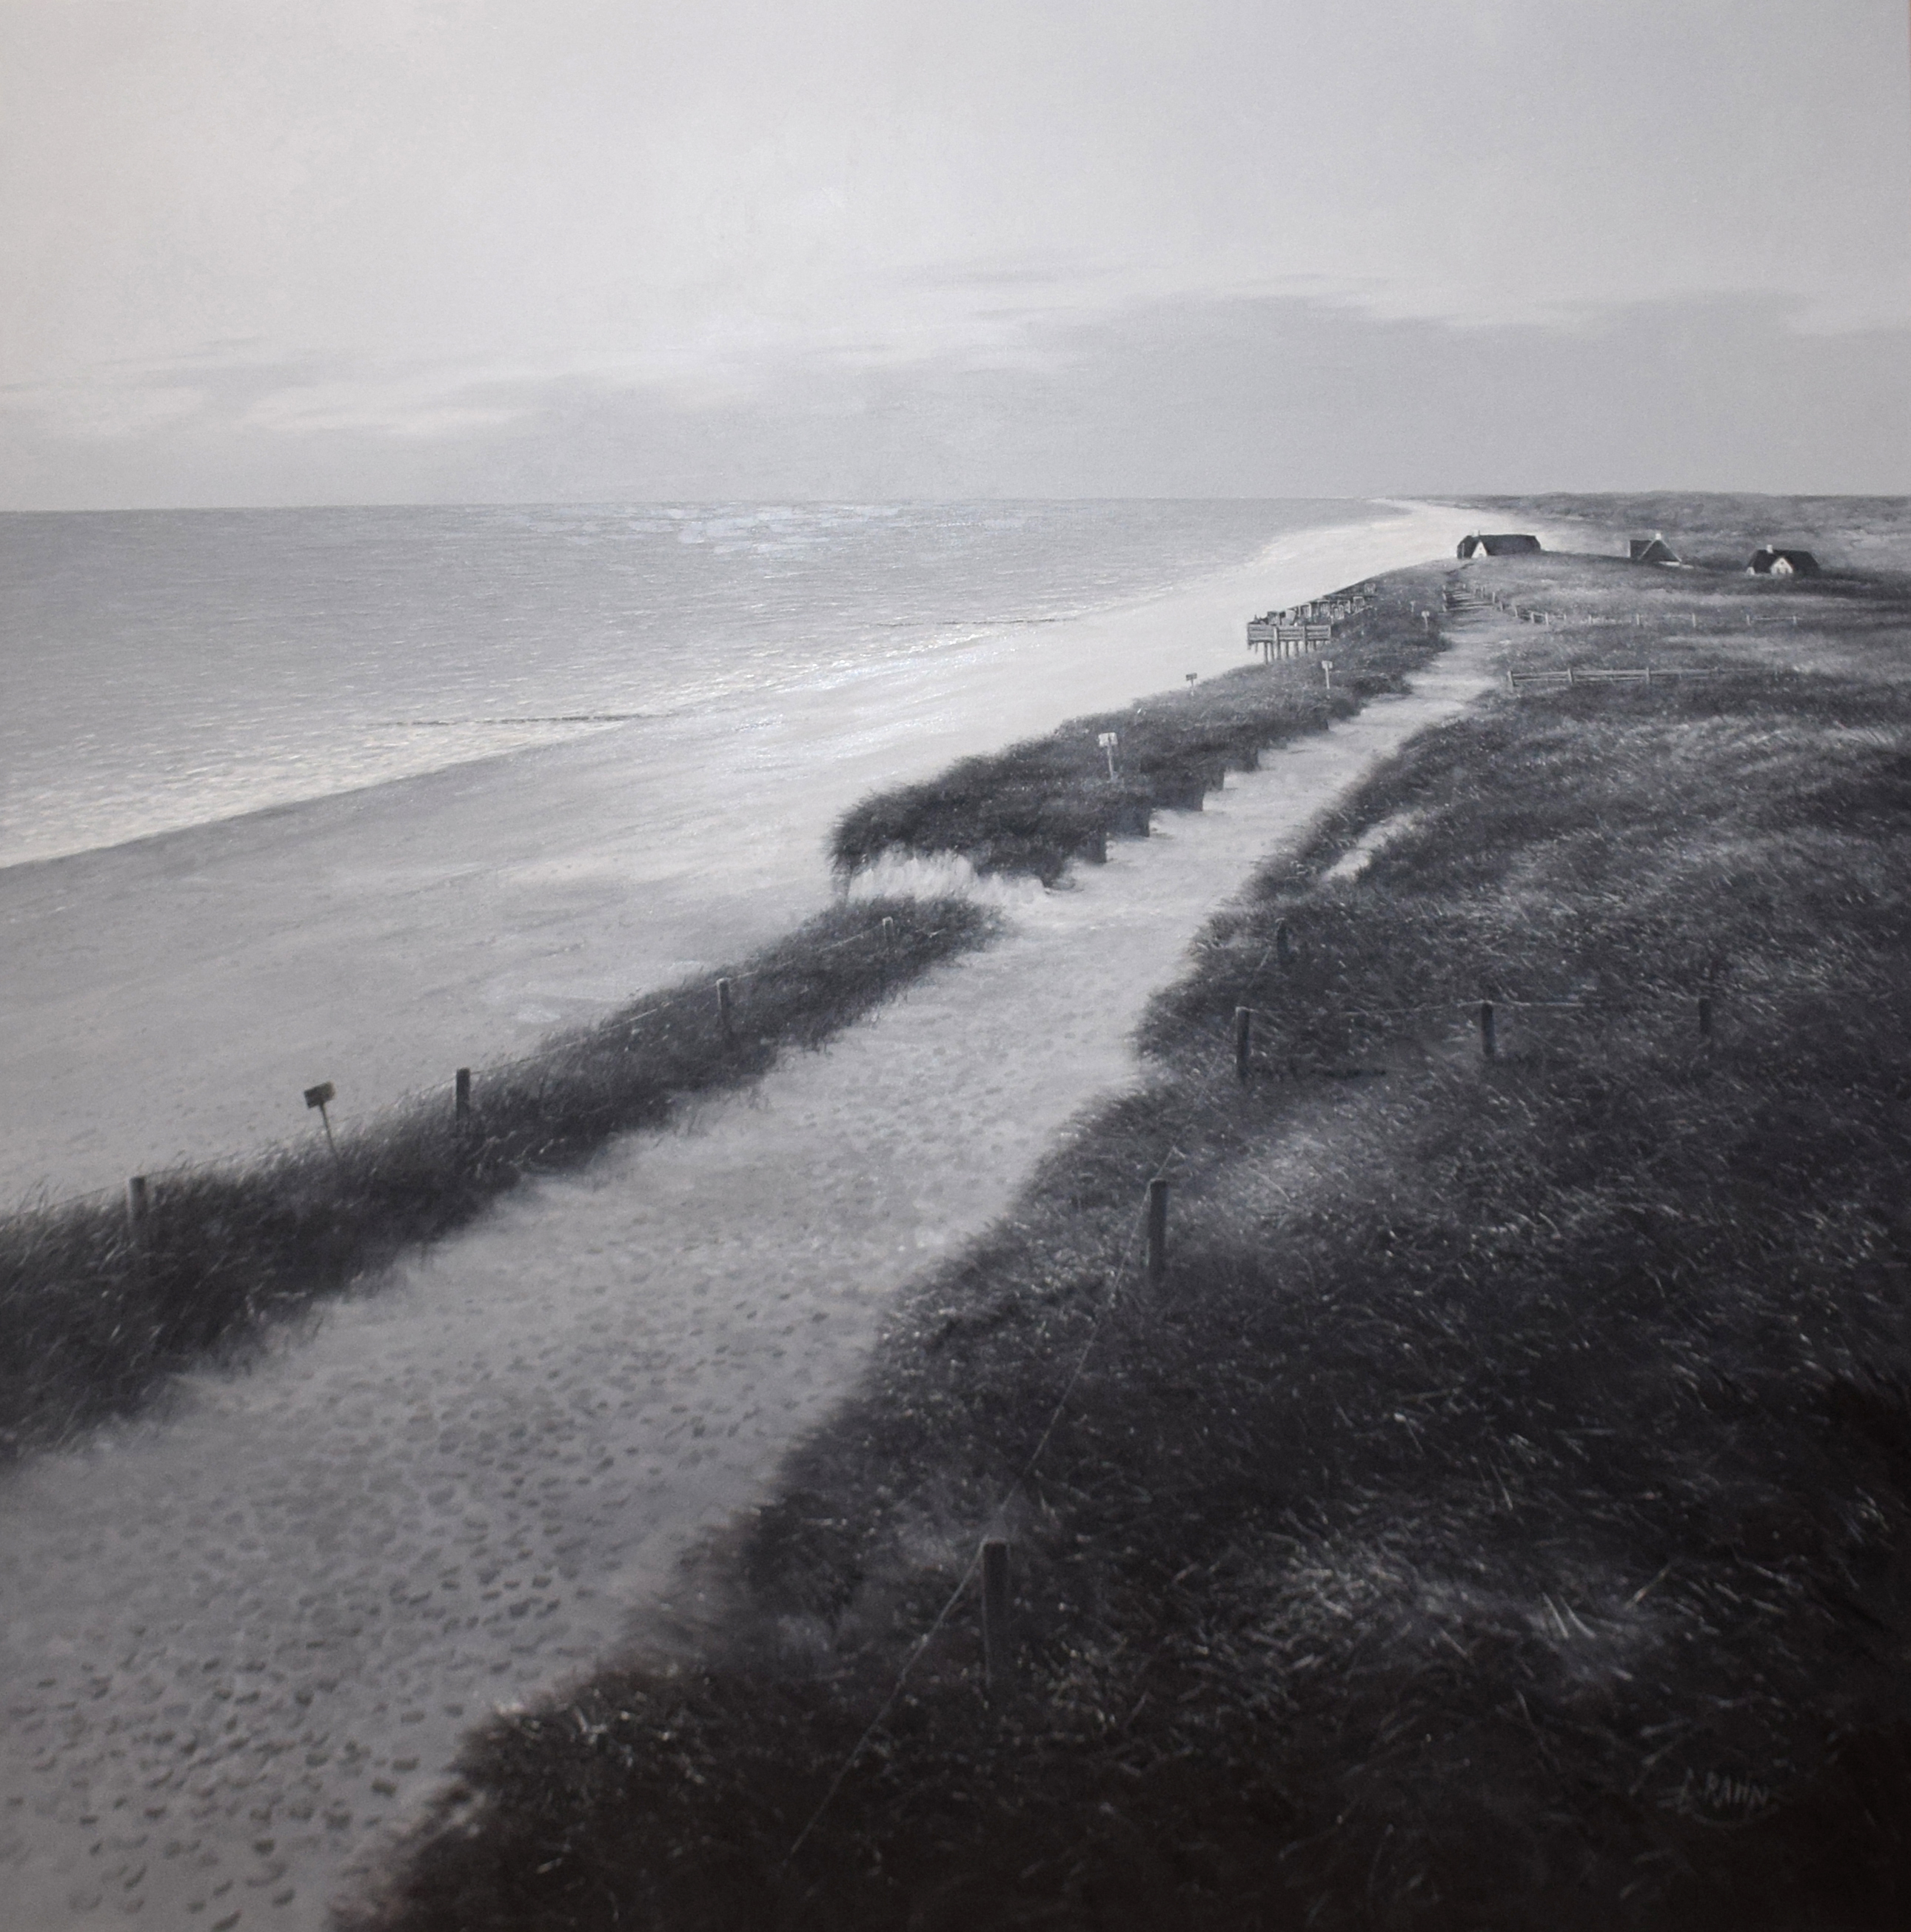 Detlef Rahn - Strand bei Kampen, Sylt , 7840-006-987